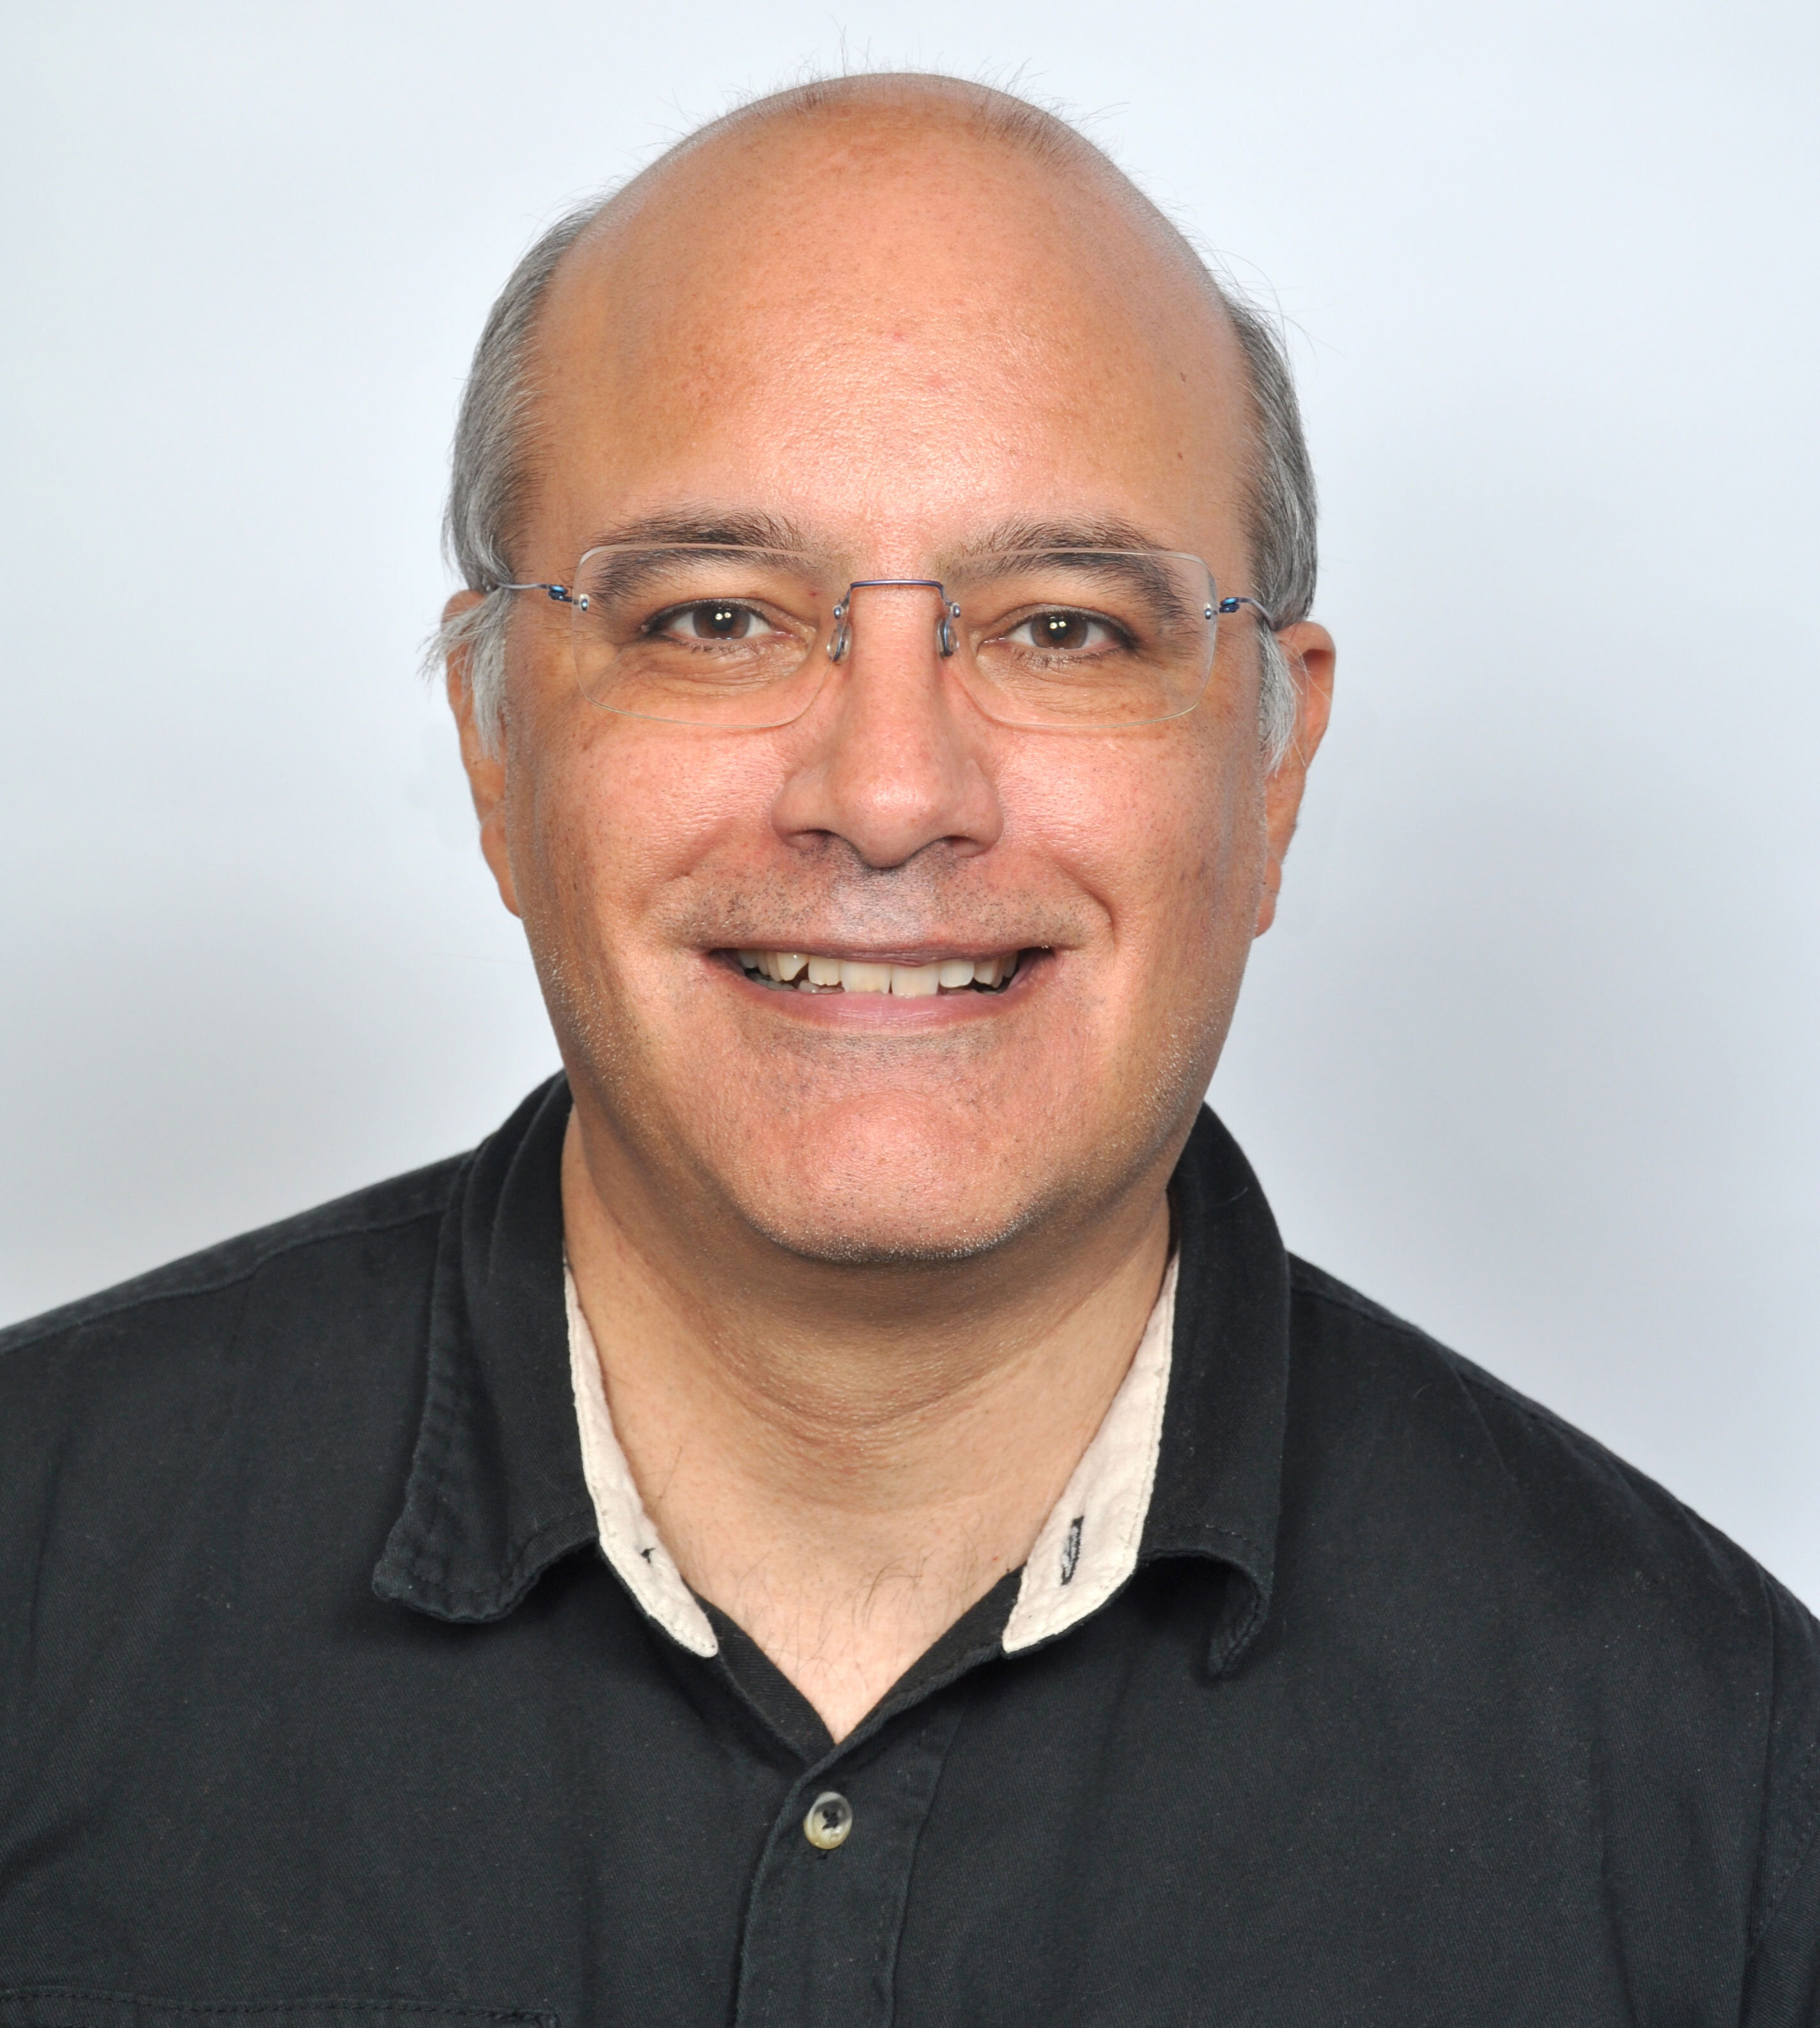 Daniel Barrois